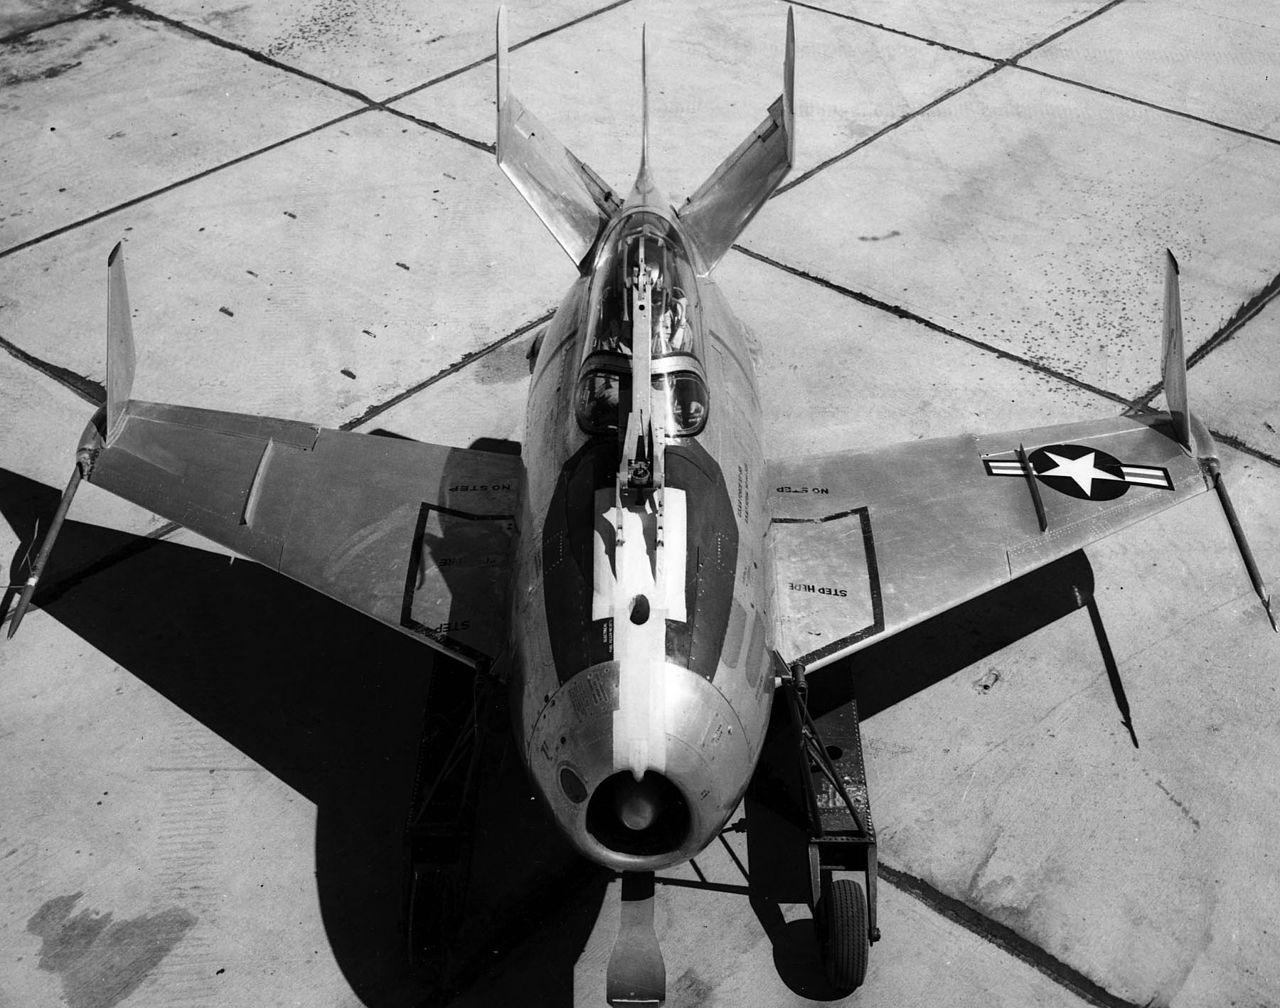 1280px-Mcdonnell_XF-85.jpg